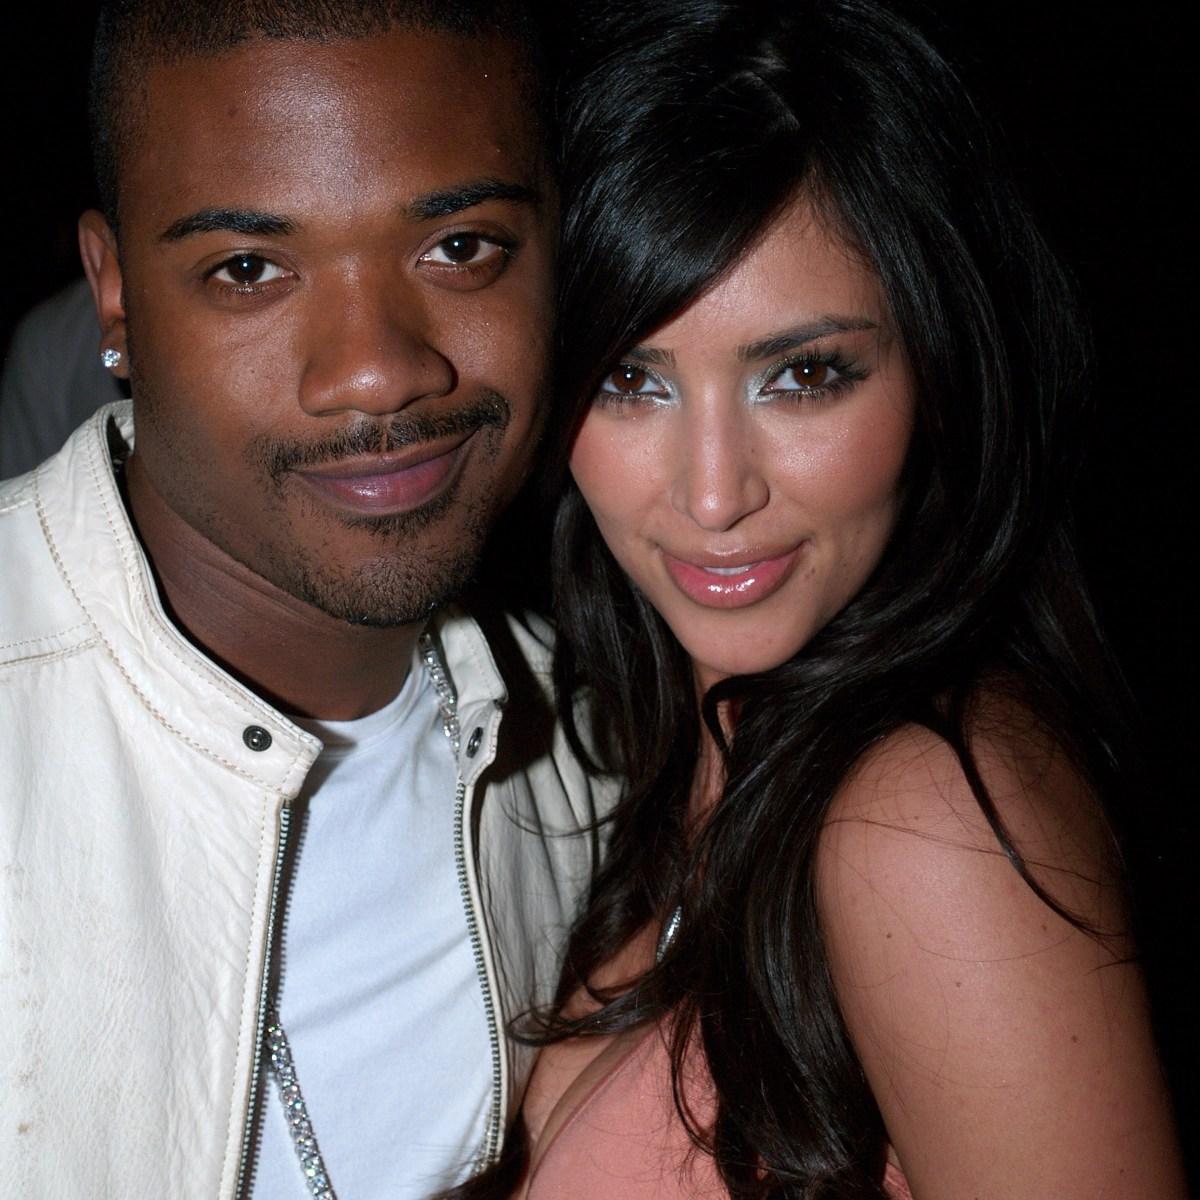 Kim Kardashian S First Husband Ex Boyfriends Our Definitive Love Timeline